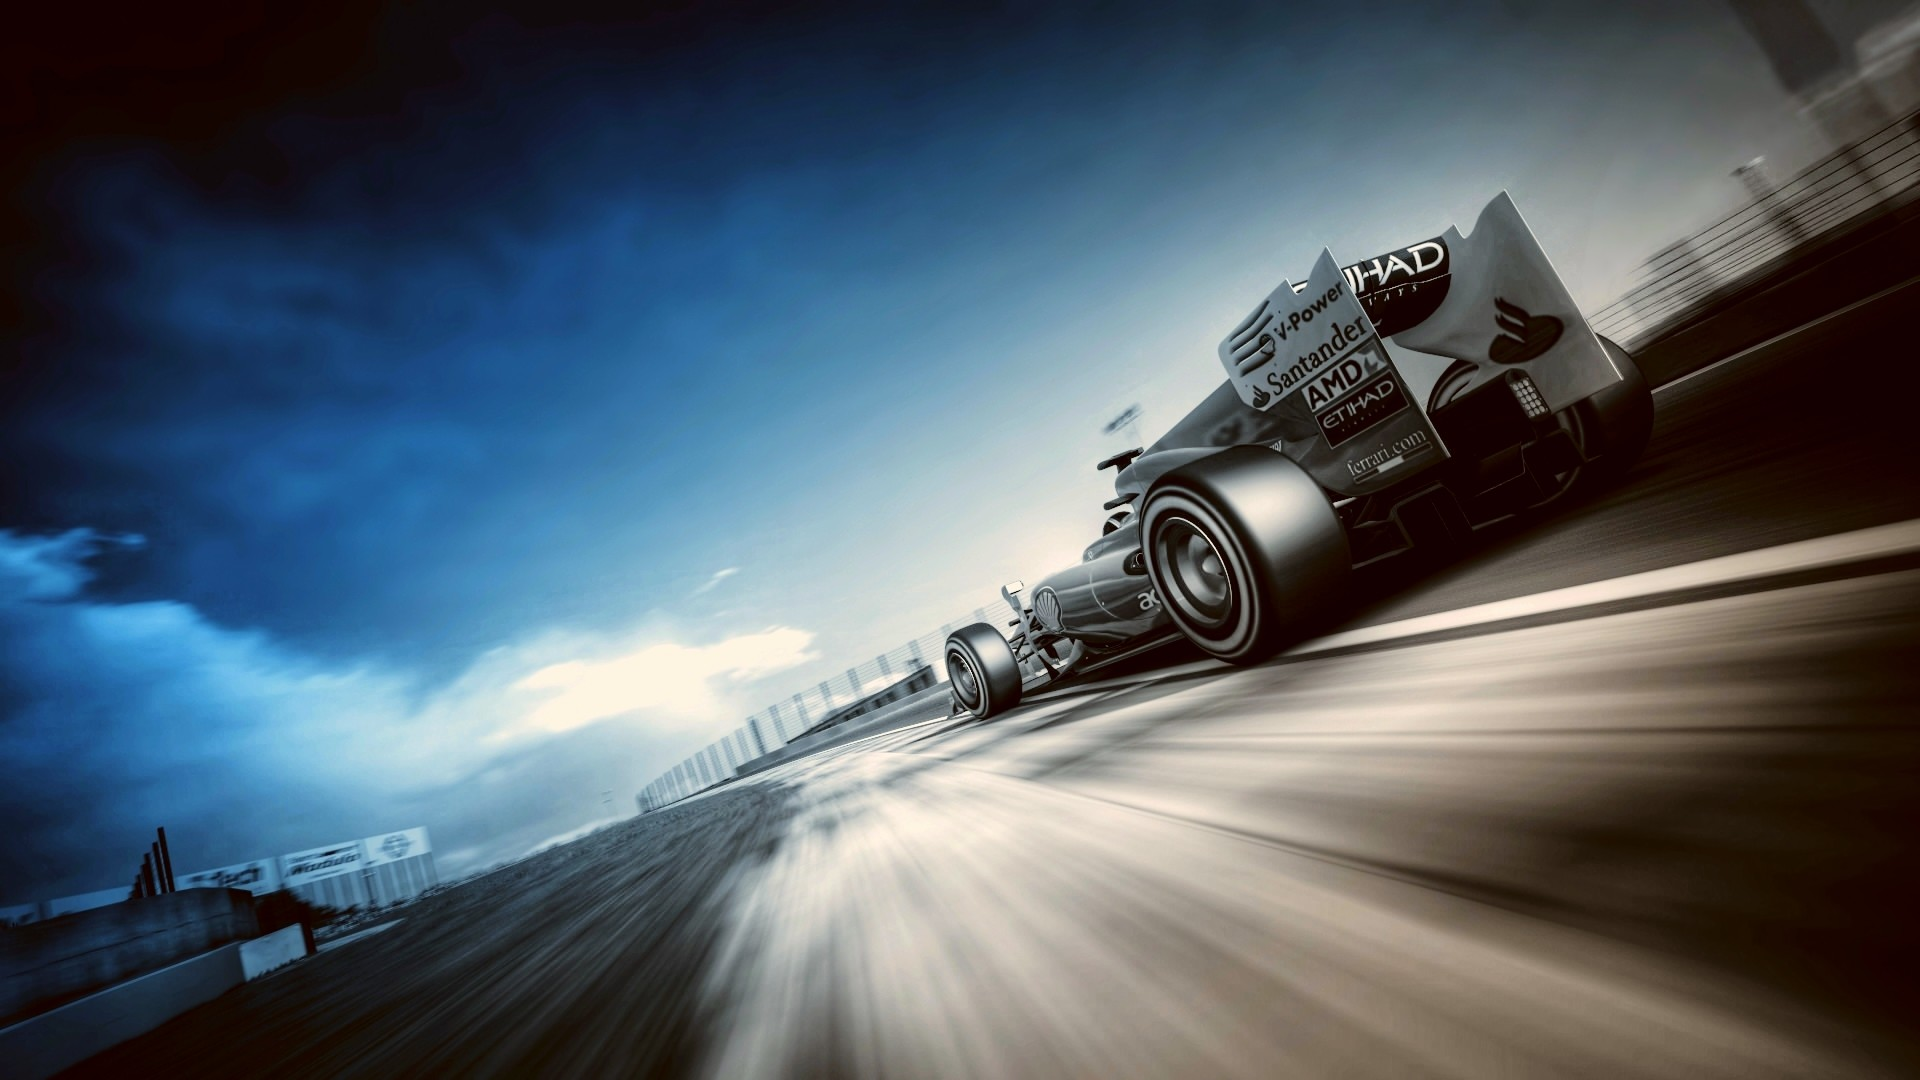 Beautiful Racing Wallpaper